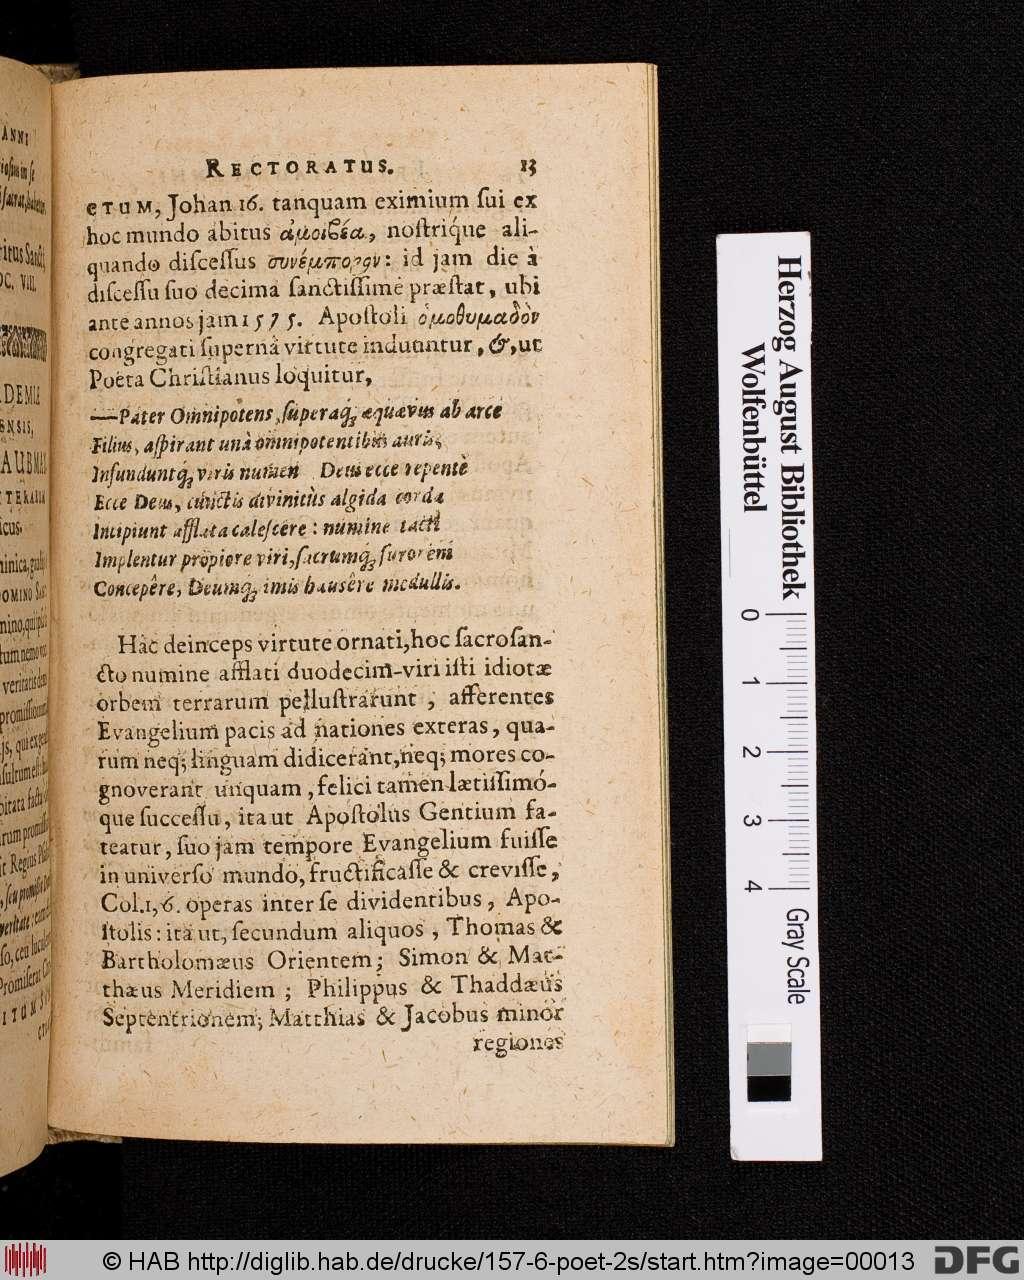 http://diglib.hab.de/drucke/157-6-poet-2s/00013.jpg